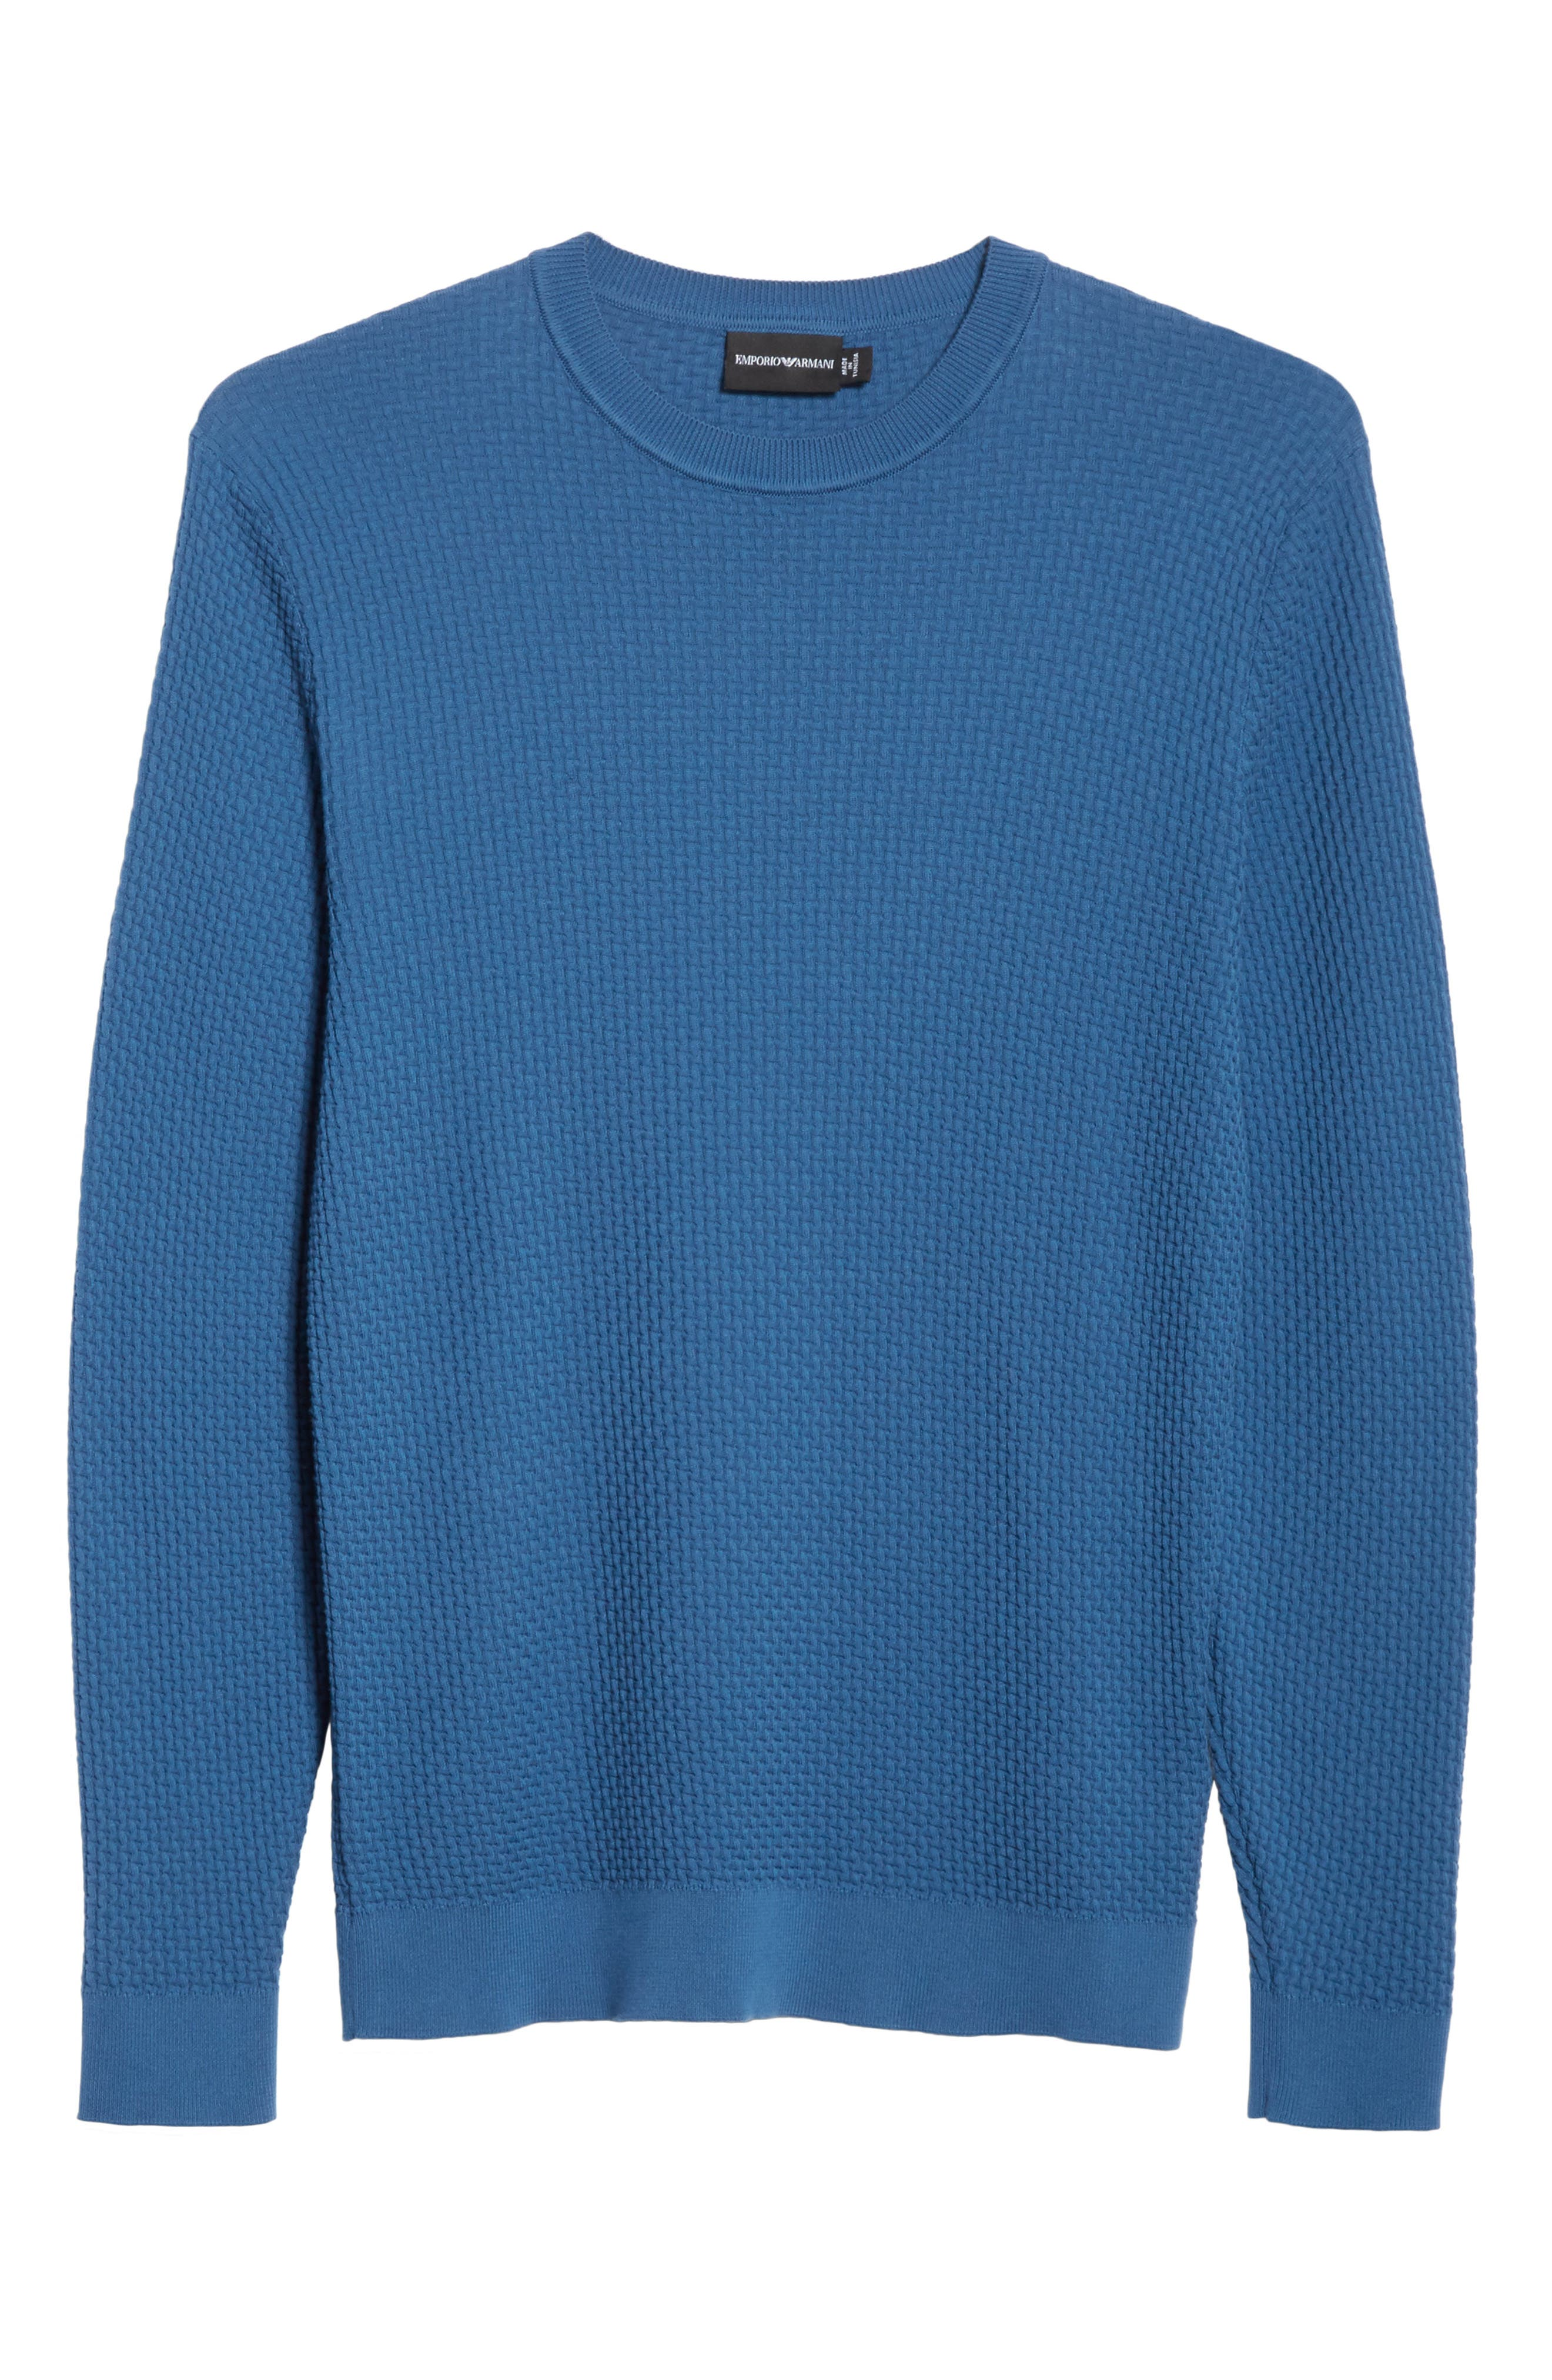 Slim Fit Textured Crew Sweater,                             Alternate thumbnail 6, color,                             Avio Scuro